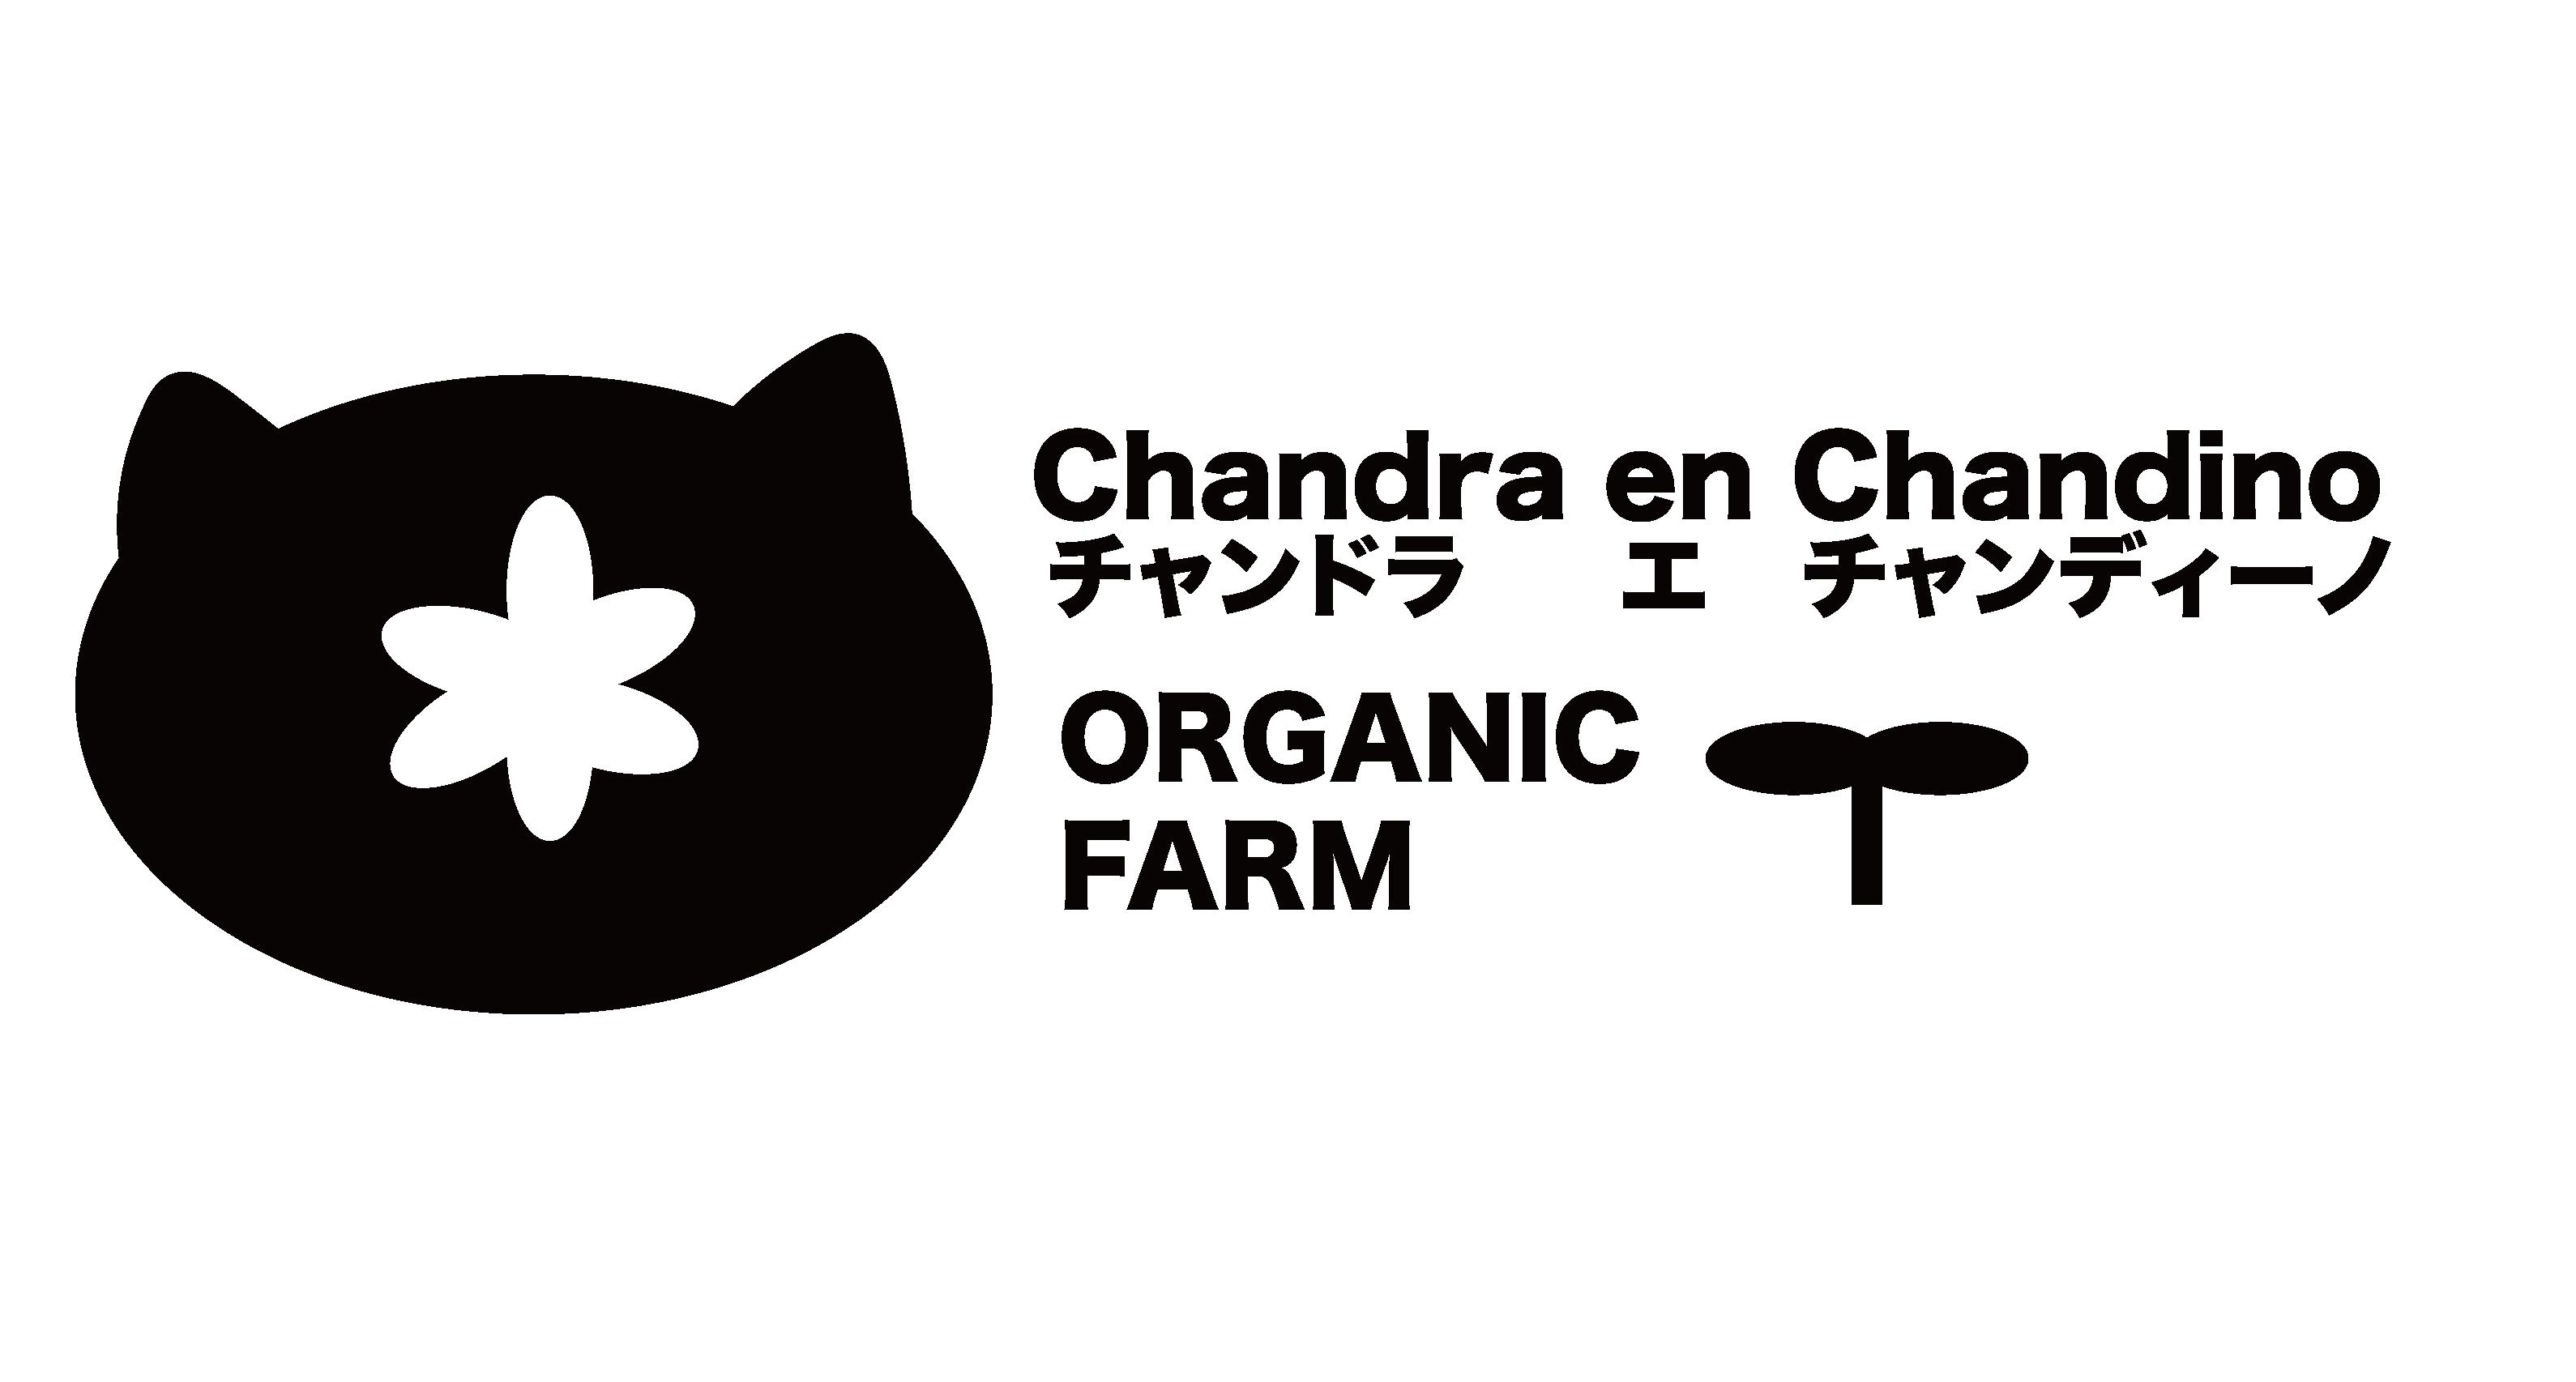 Chandra en Chandino